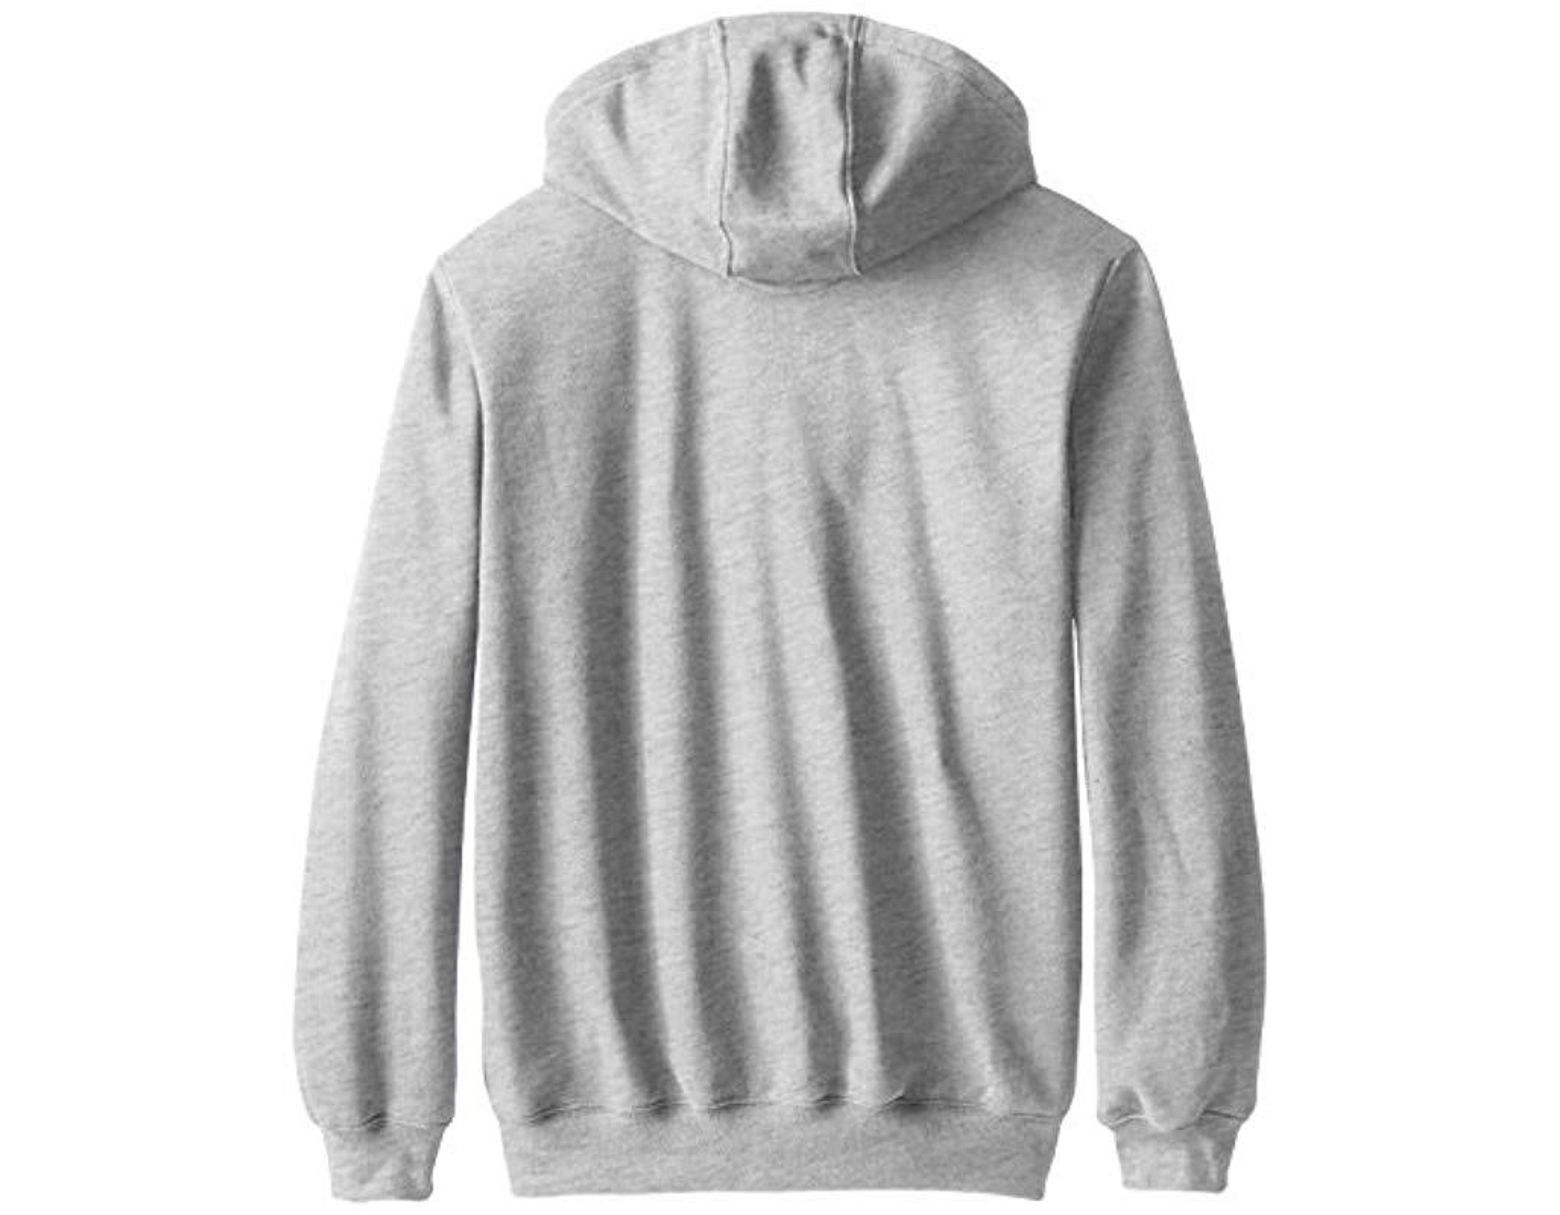 45a0f17b2 Men's Gray Midweight Hooded Zip Front Sweatshirt